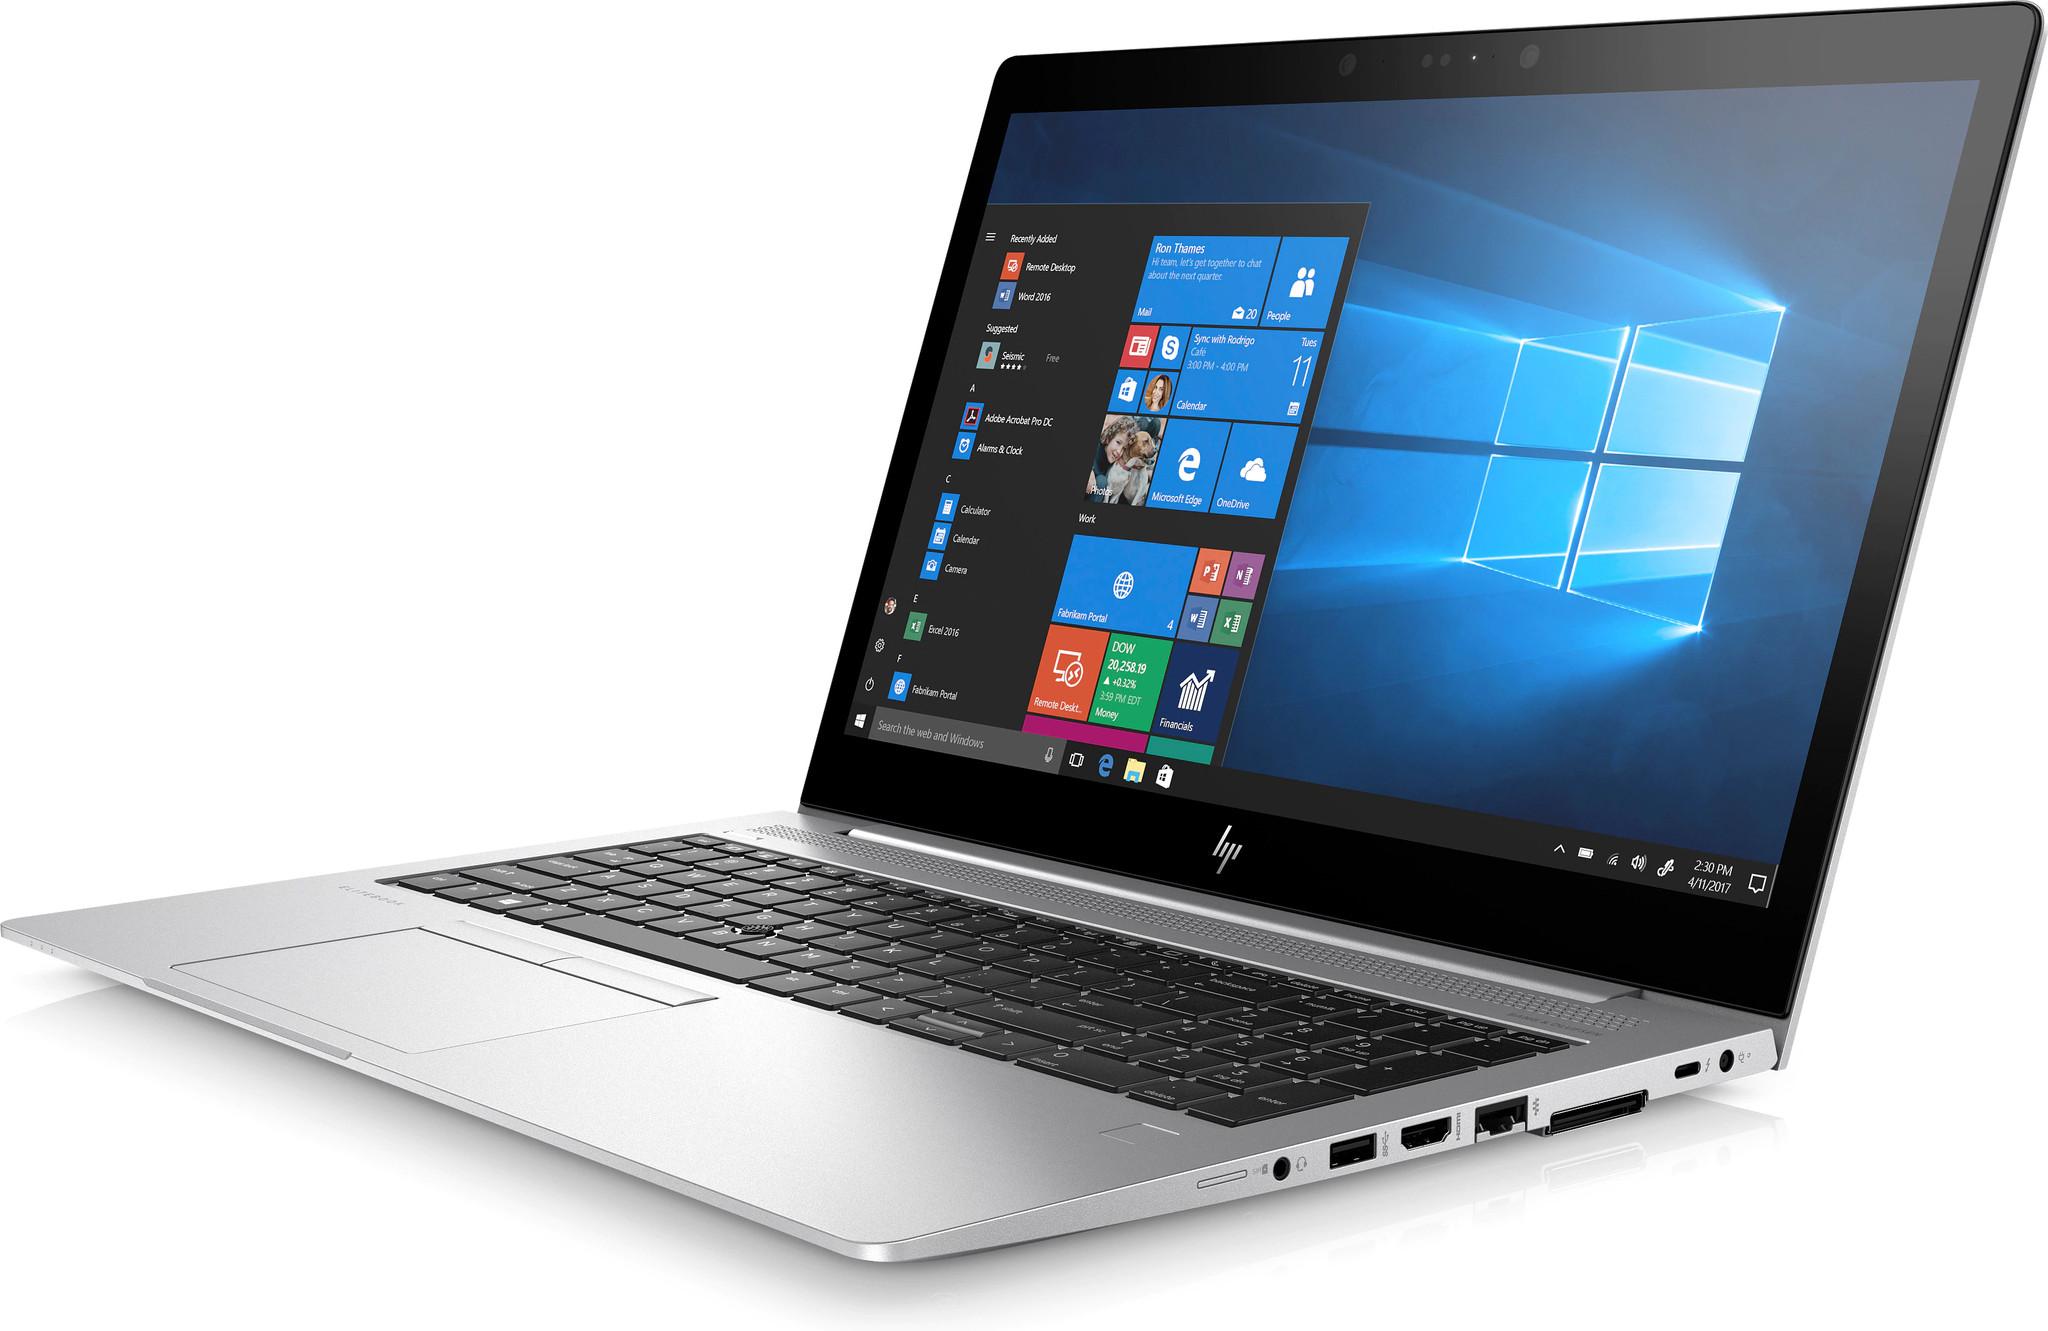 HP Elitebook 850 G5 i5-8gb-256ssd